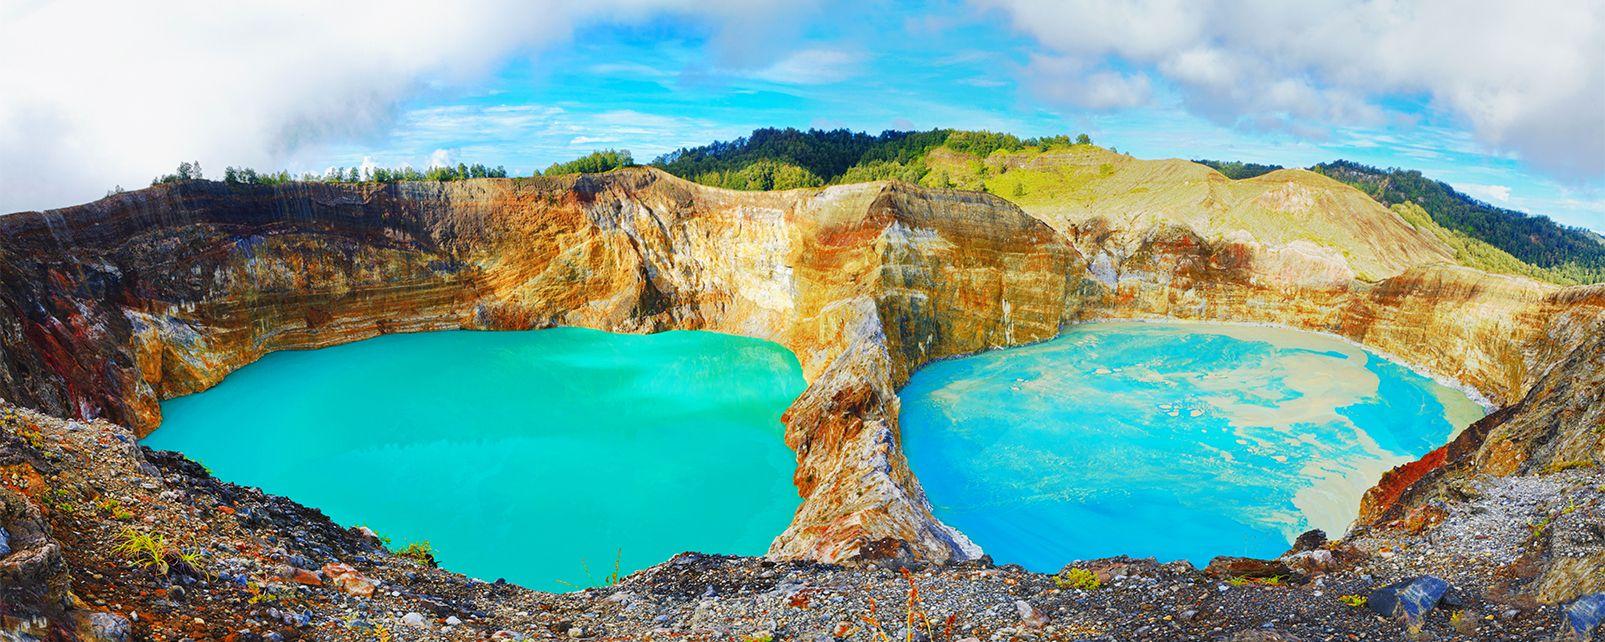 Parc National du Kelimutu , Indonésie